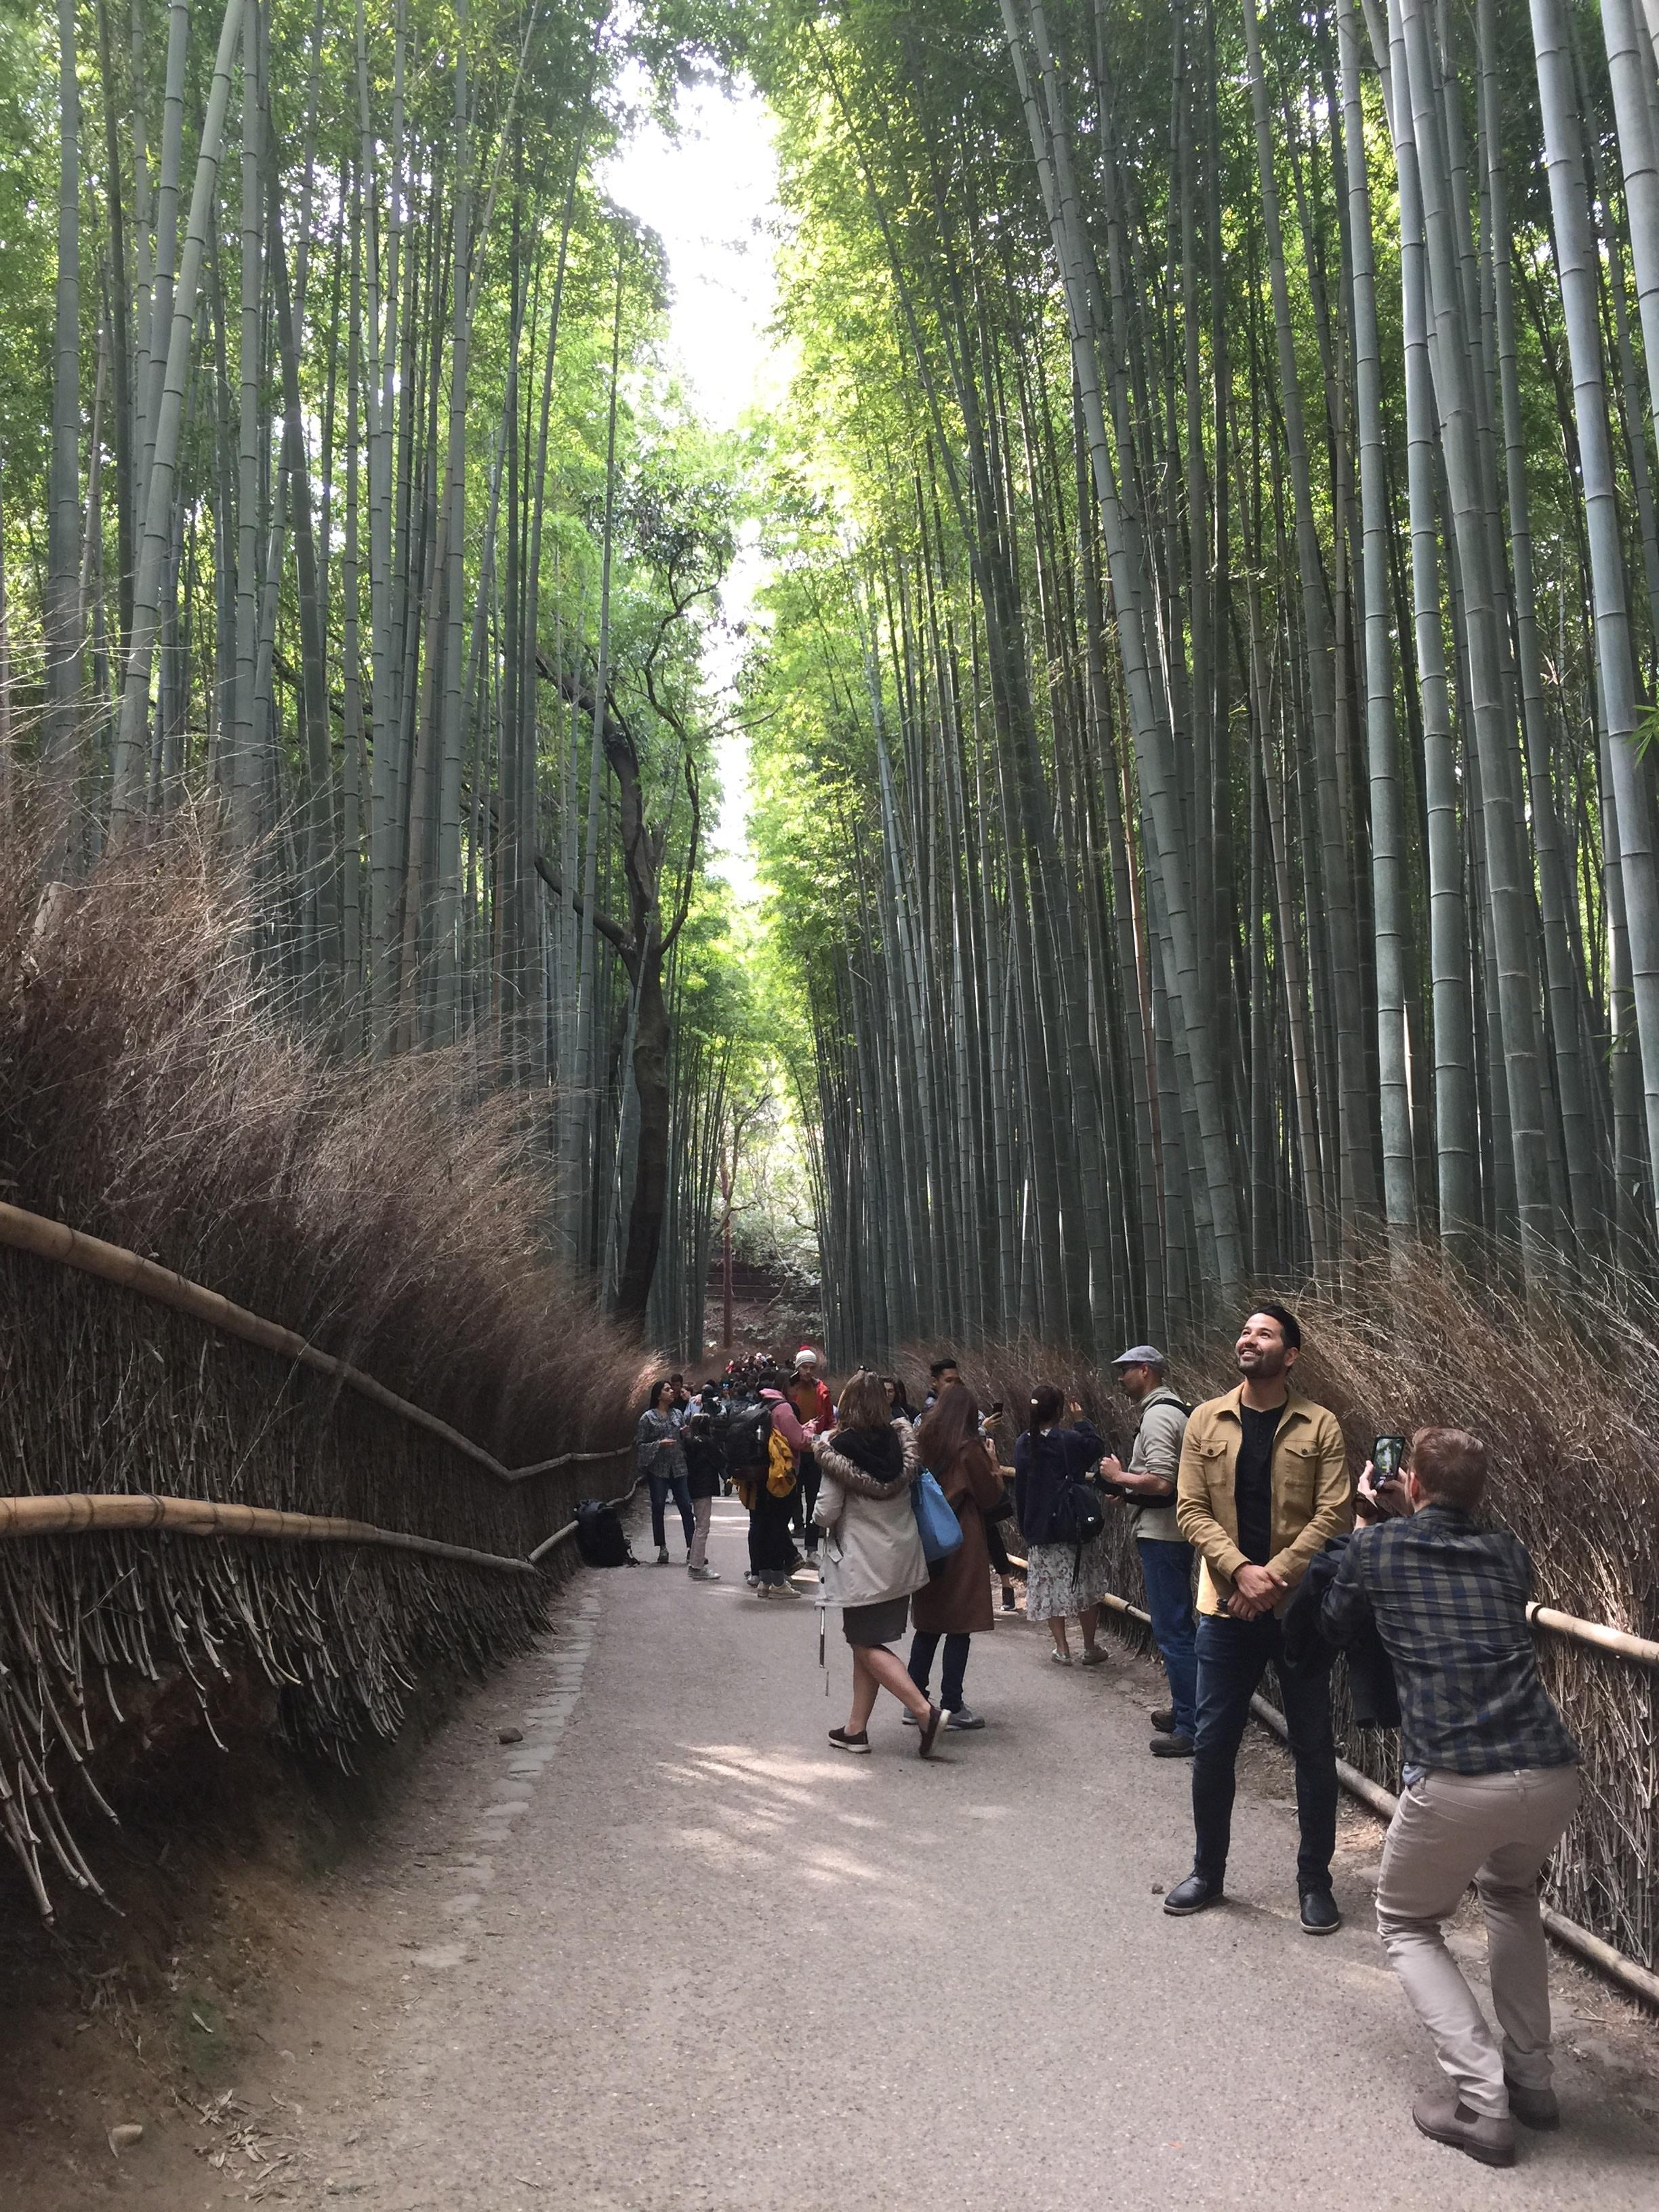 Arashiyama - Sagano Bamboo Groves (2 of 2)